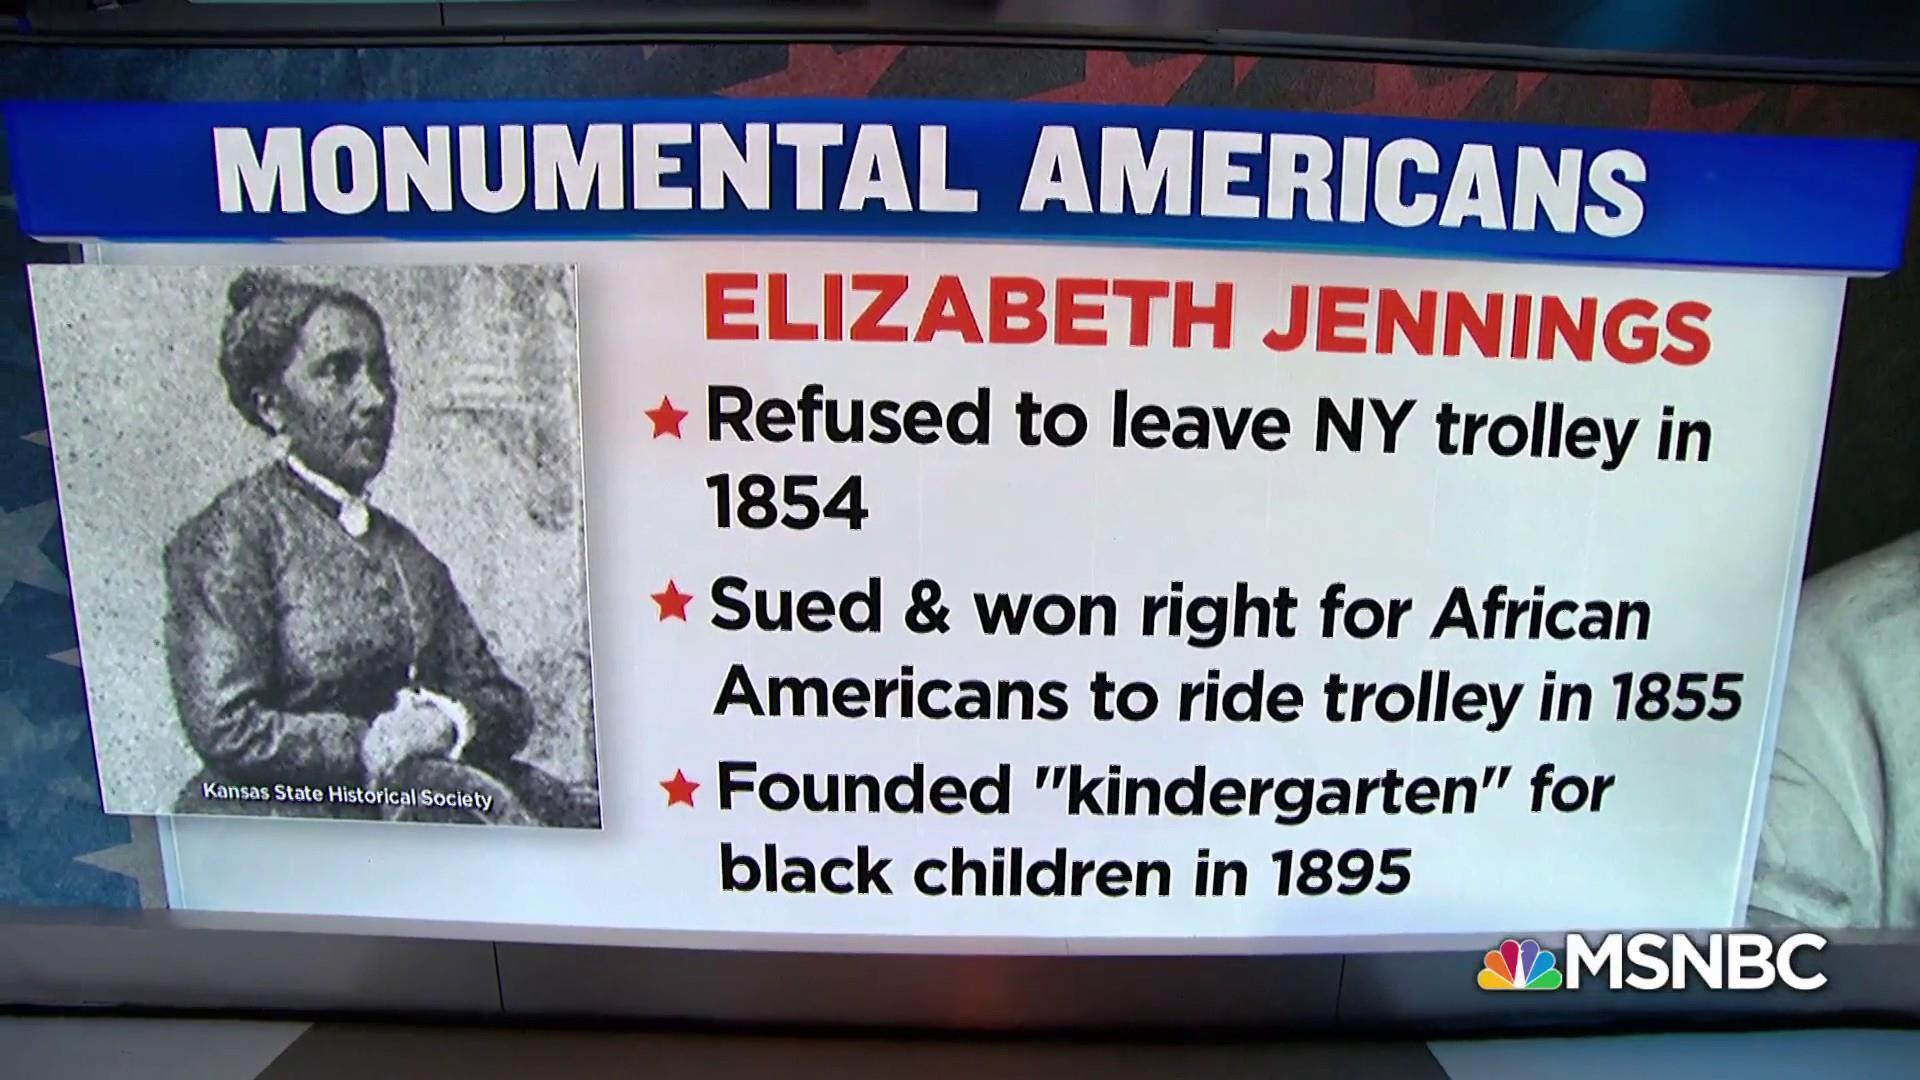 #MonumentalAmerican: Civil Rights activist Elizabeth Jennings